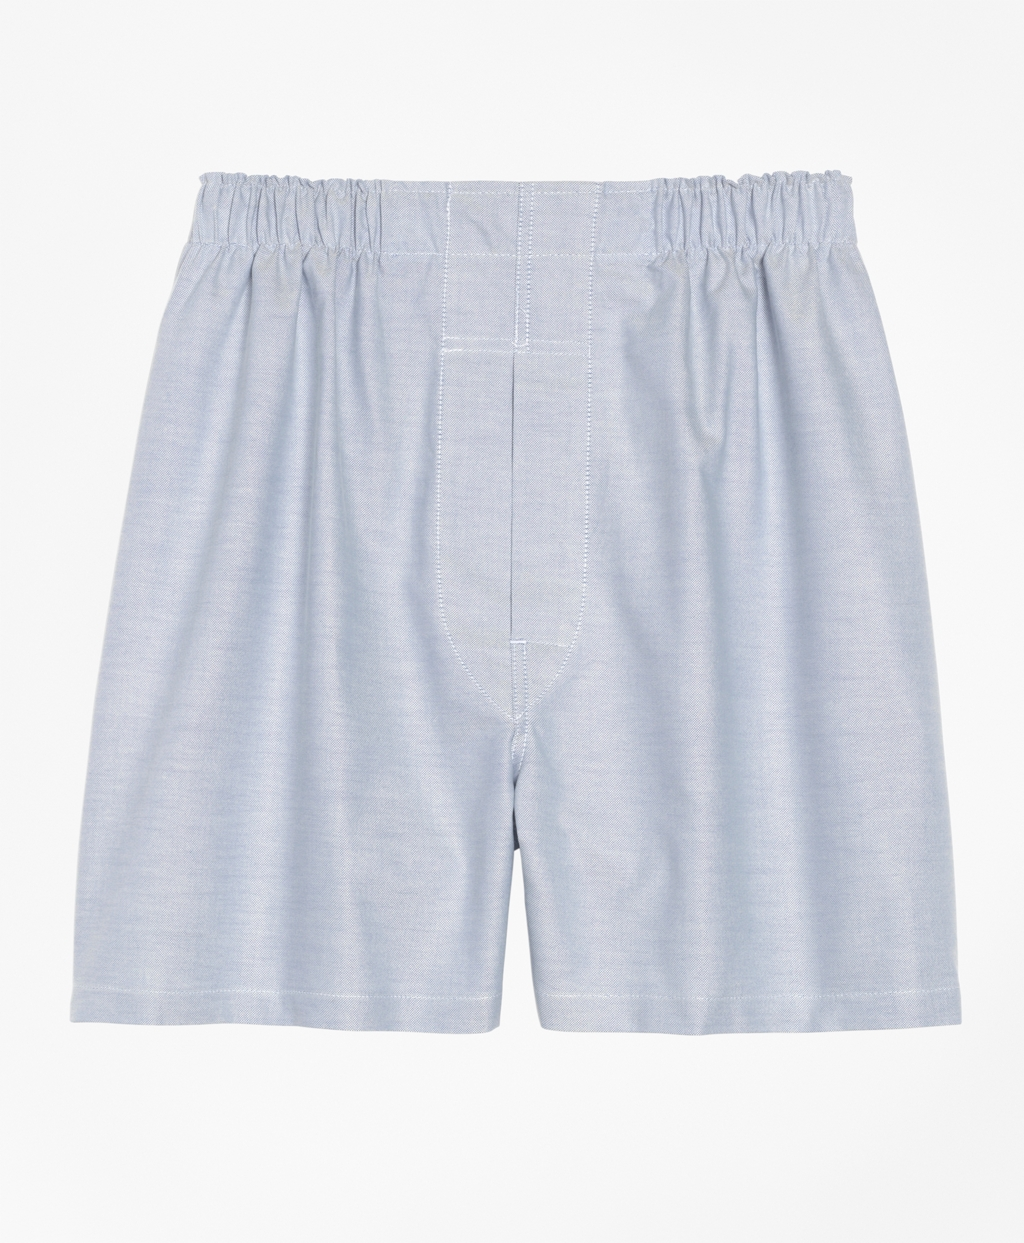 1940s Men's Underwear: Briefs, Boxers, Unions, & Socks Brooks Brothers Mens Slim Fit Oxford Boxers $17.50 AT vintagedancer.com